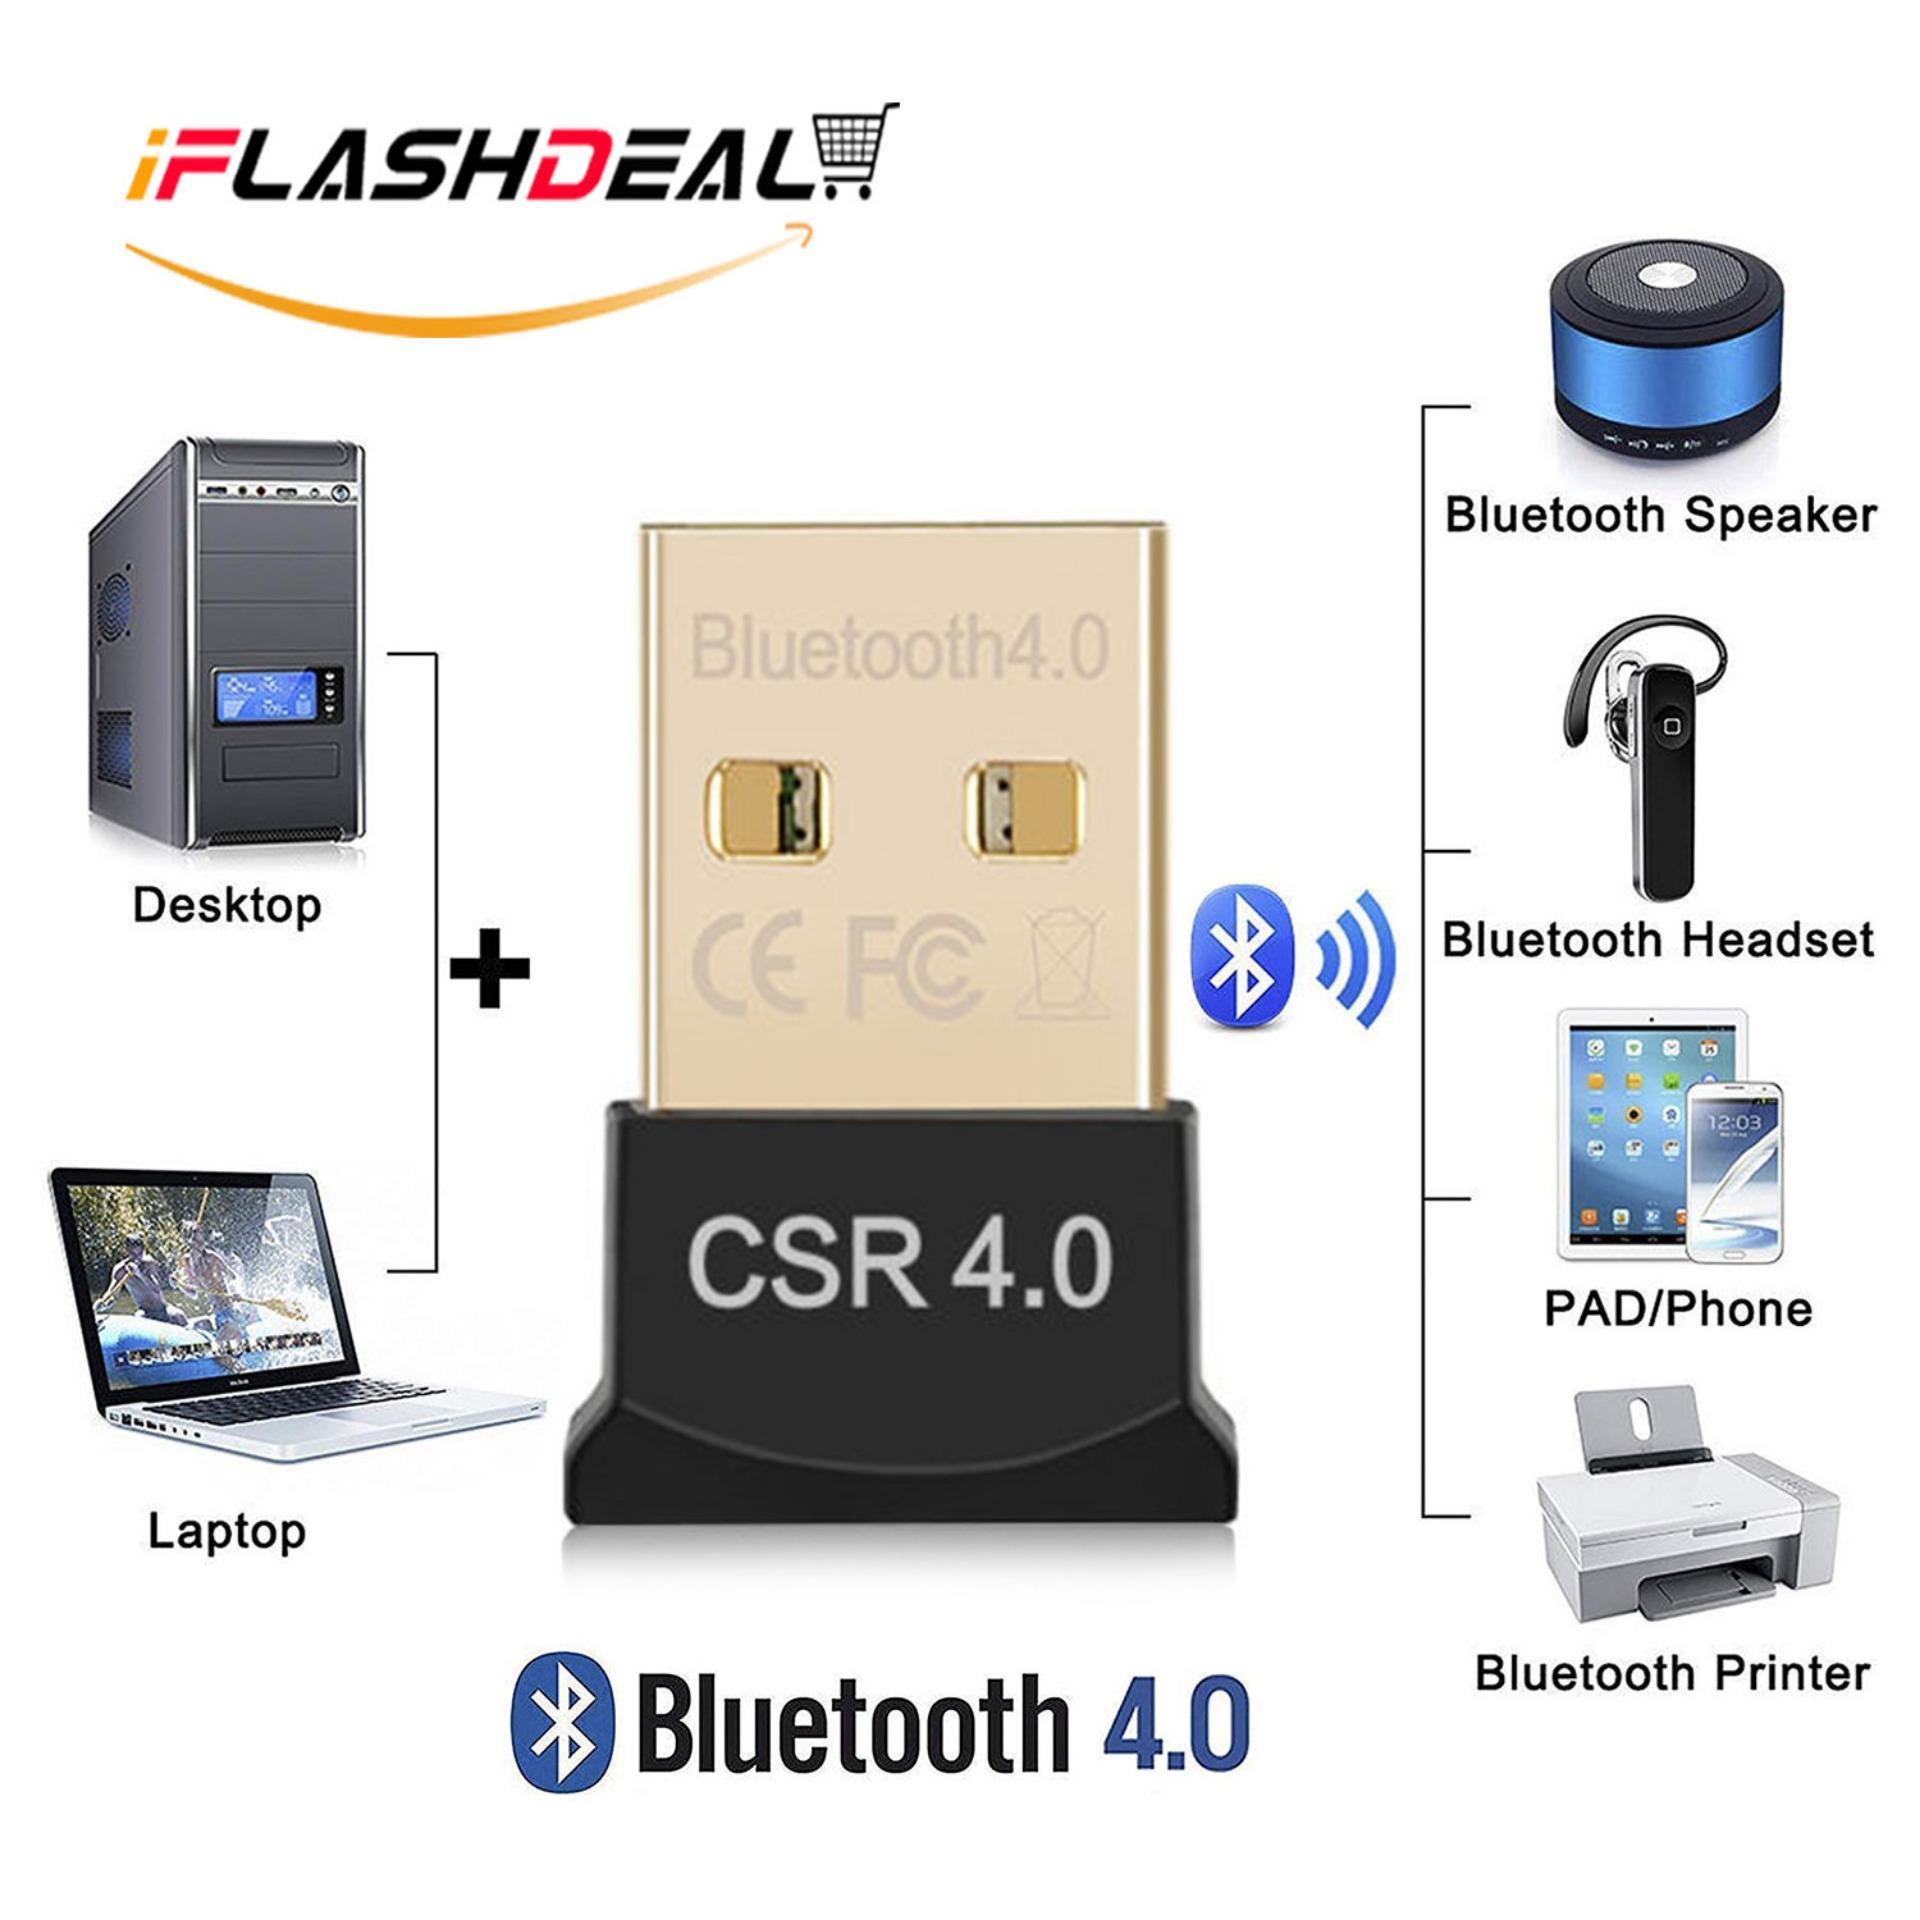 Wireless USB 2.0 CSR 4.0 Dongle Adapter for PC LAPTOP WIN XP VISTA 7 8 10